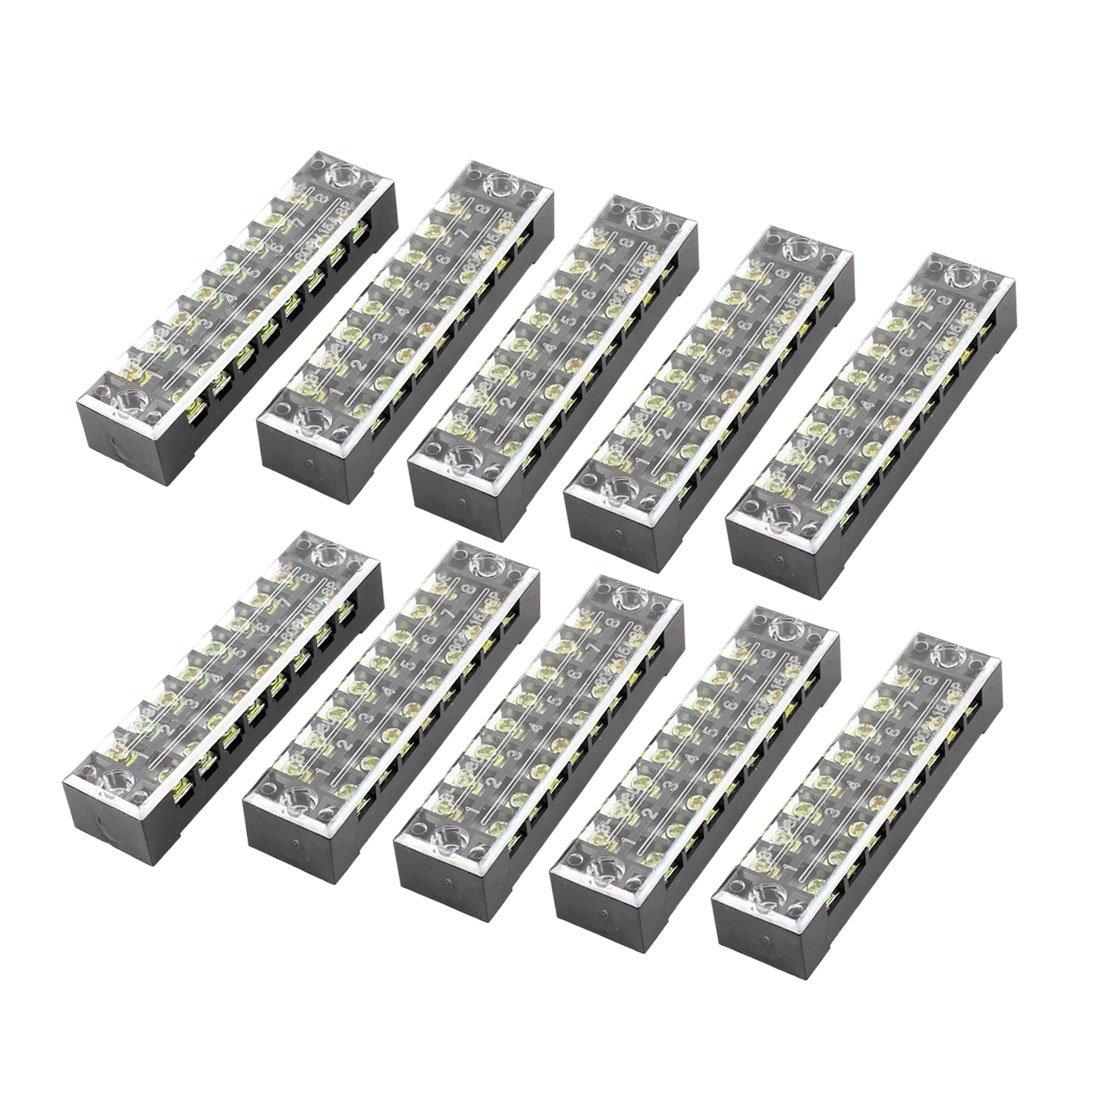 uxcell 600V 15A Dual Row 8 Position Screw Barrier Terminal Block Strip 10 Pcs a14052000ux0449